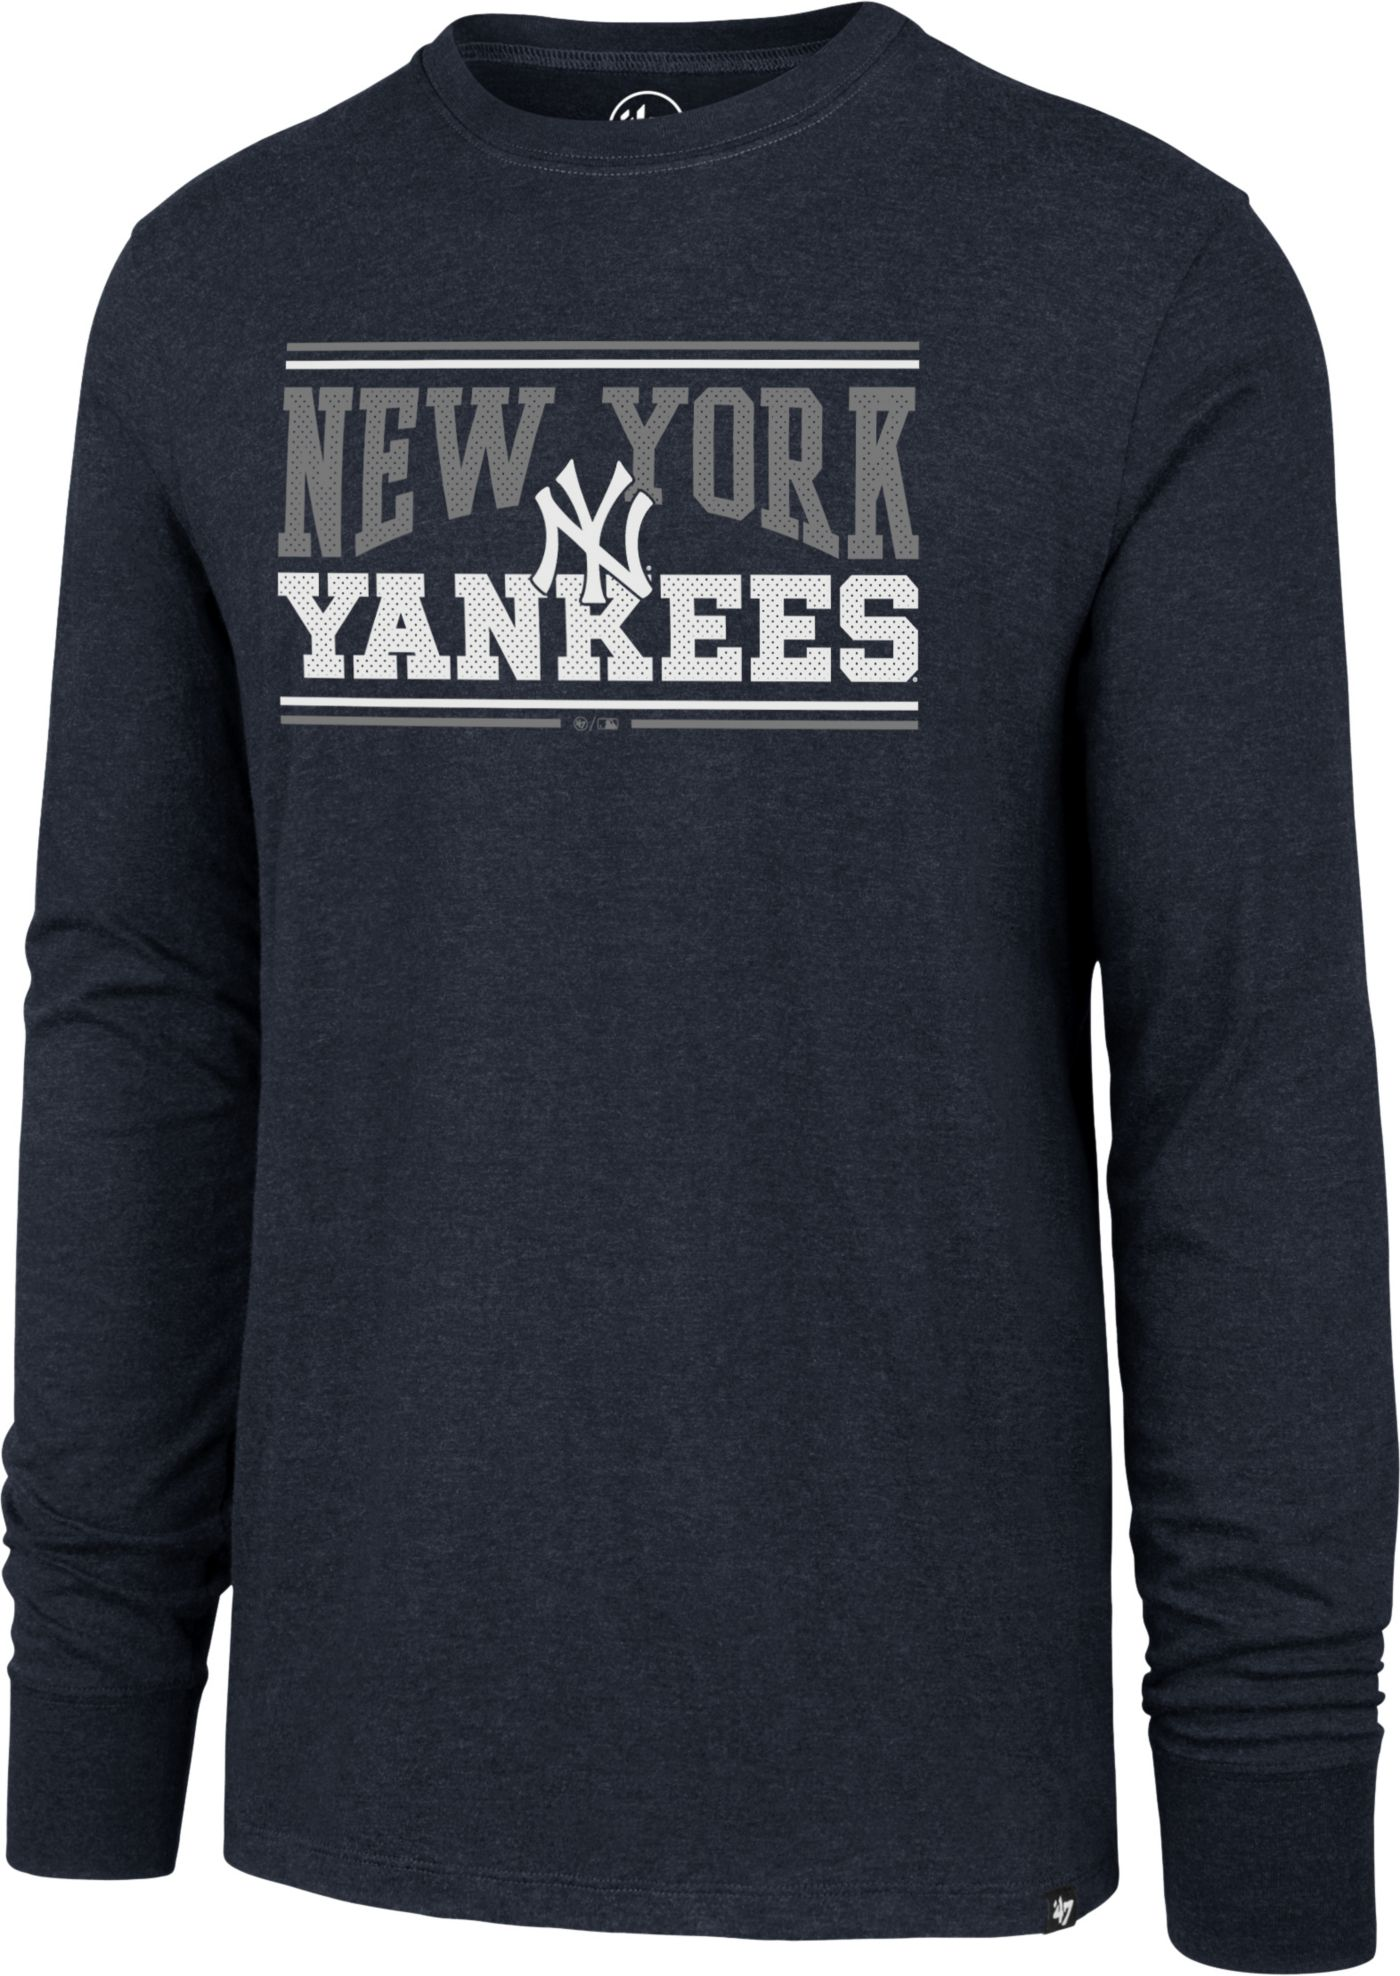 '47 Men's New York Yankees Club Long Sleeve Shirt